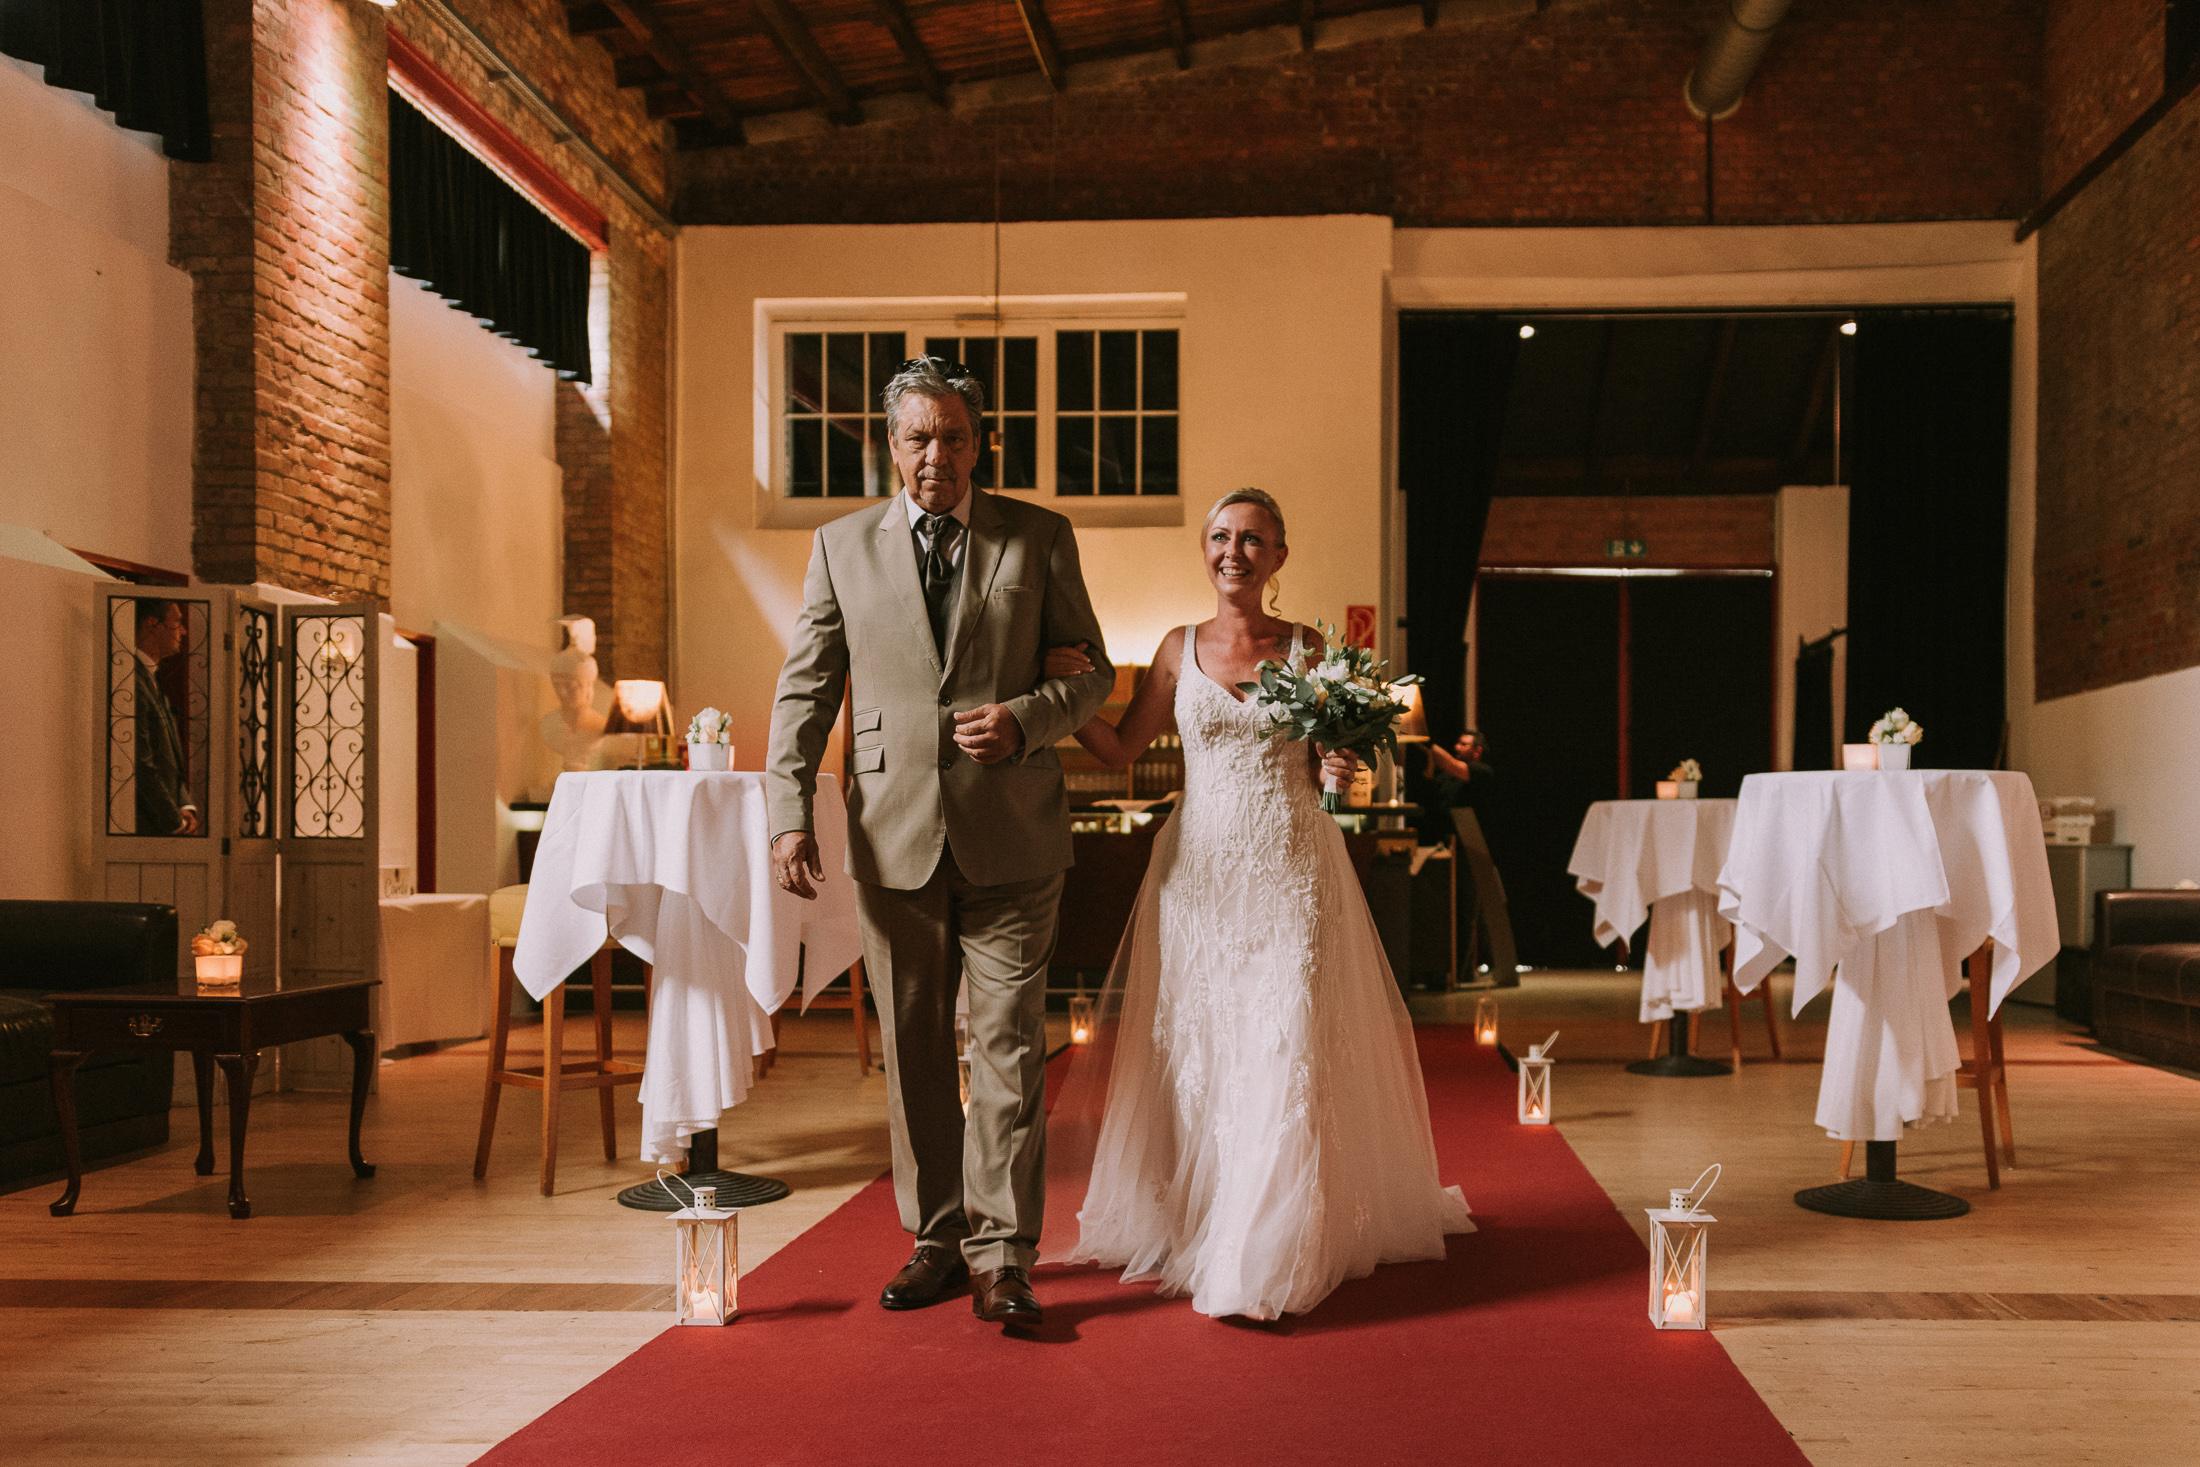 SebastianDon-Hochzeitsfotograf-Wien Umgebung-9.jpg